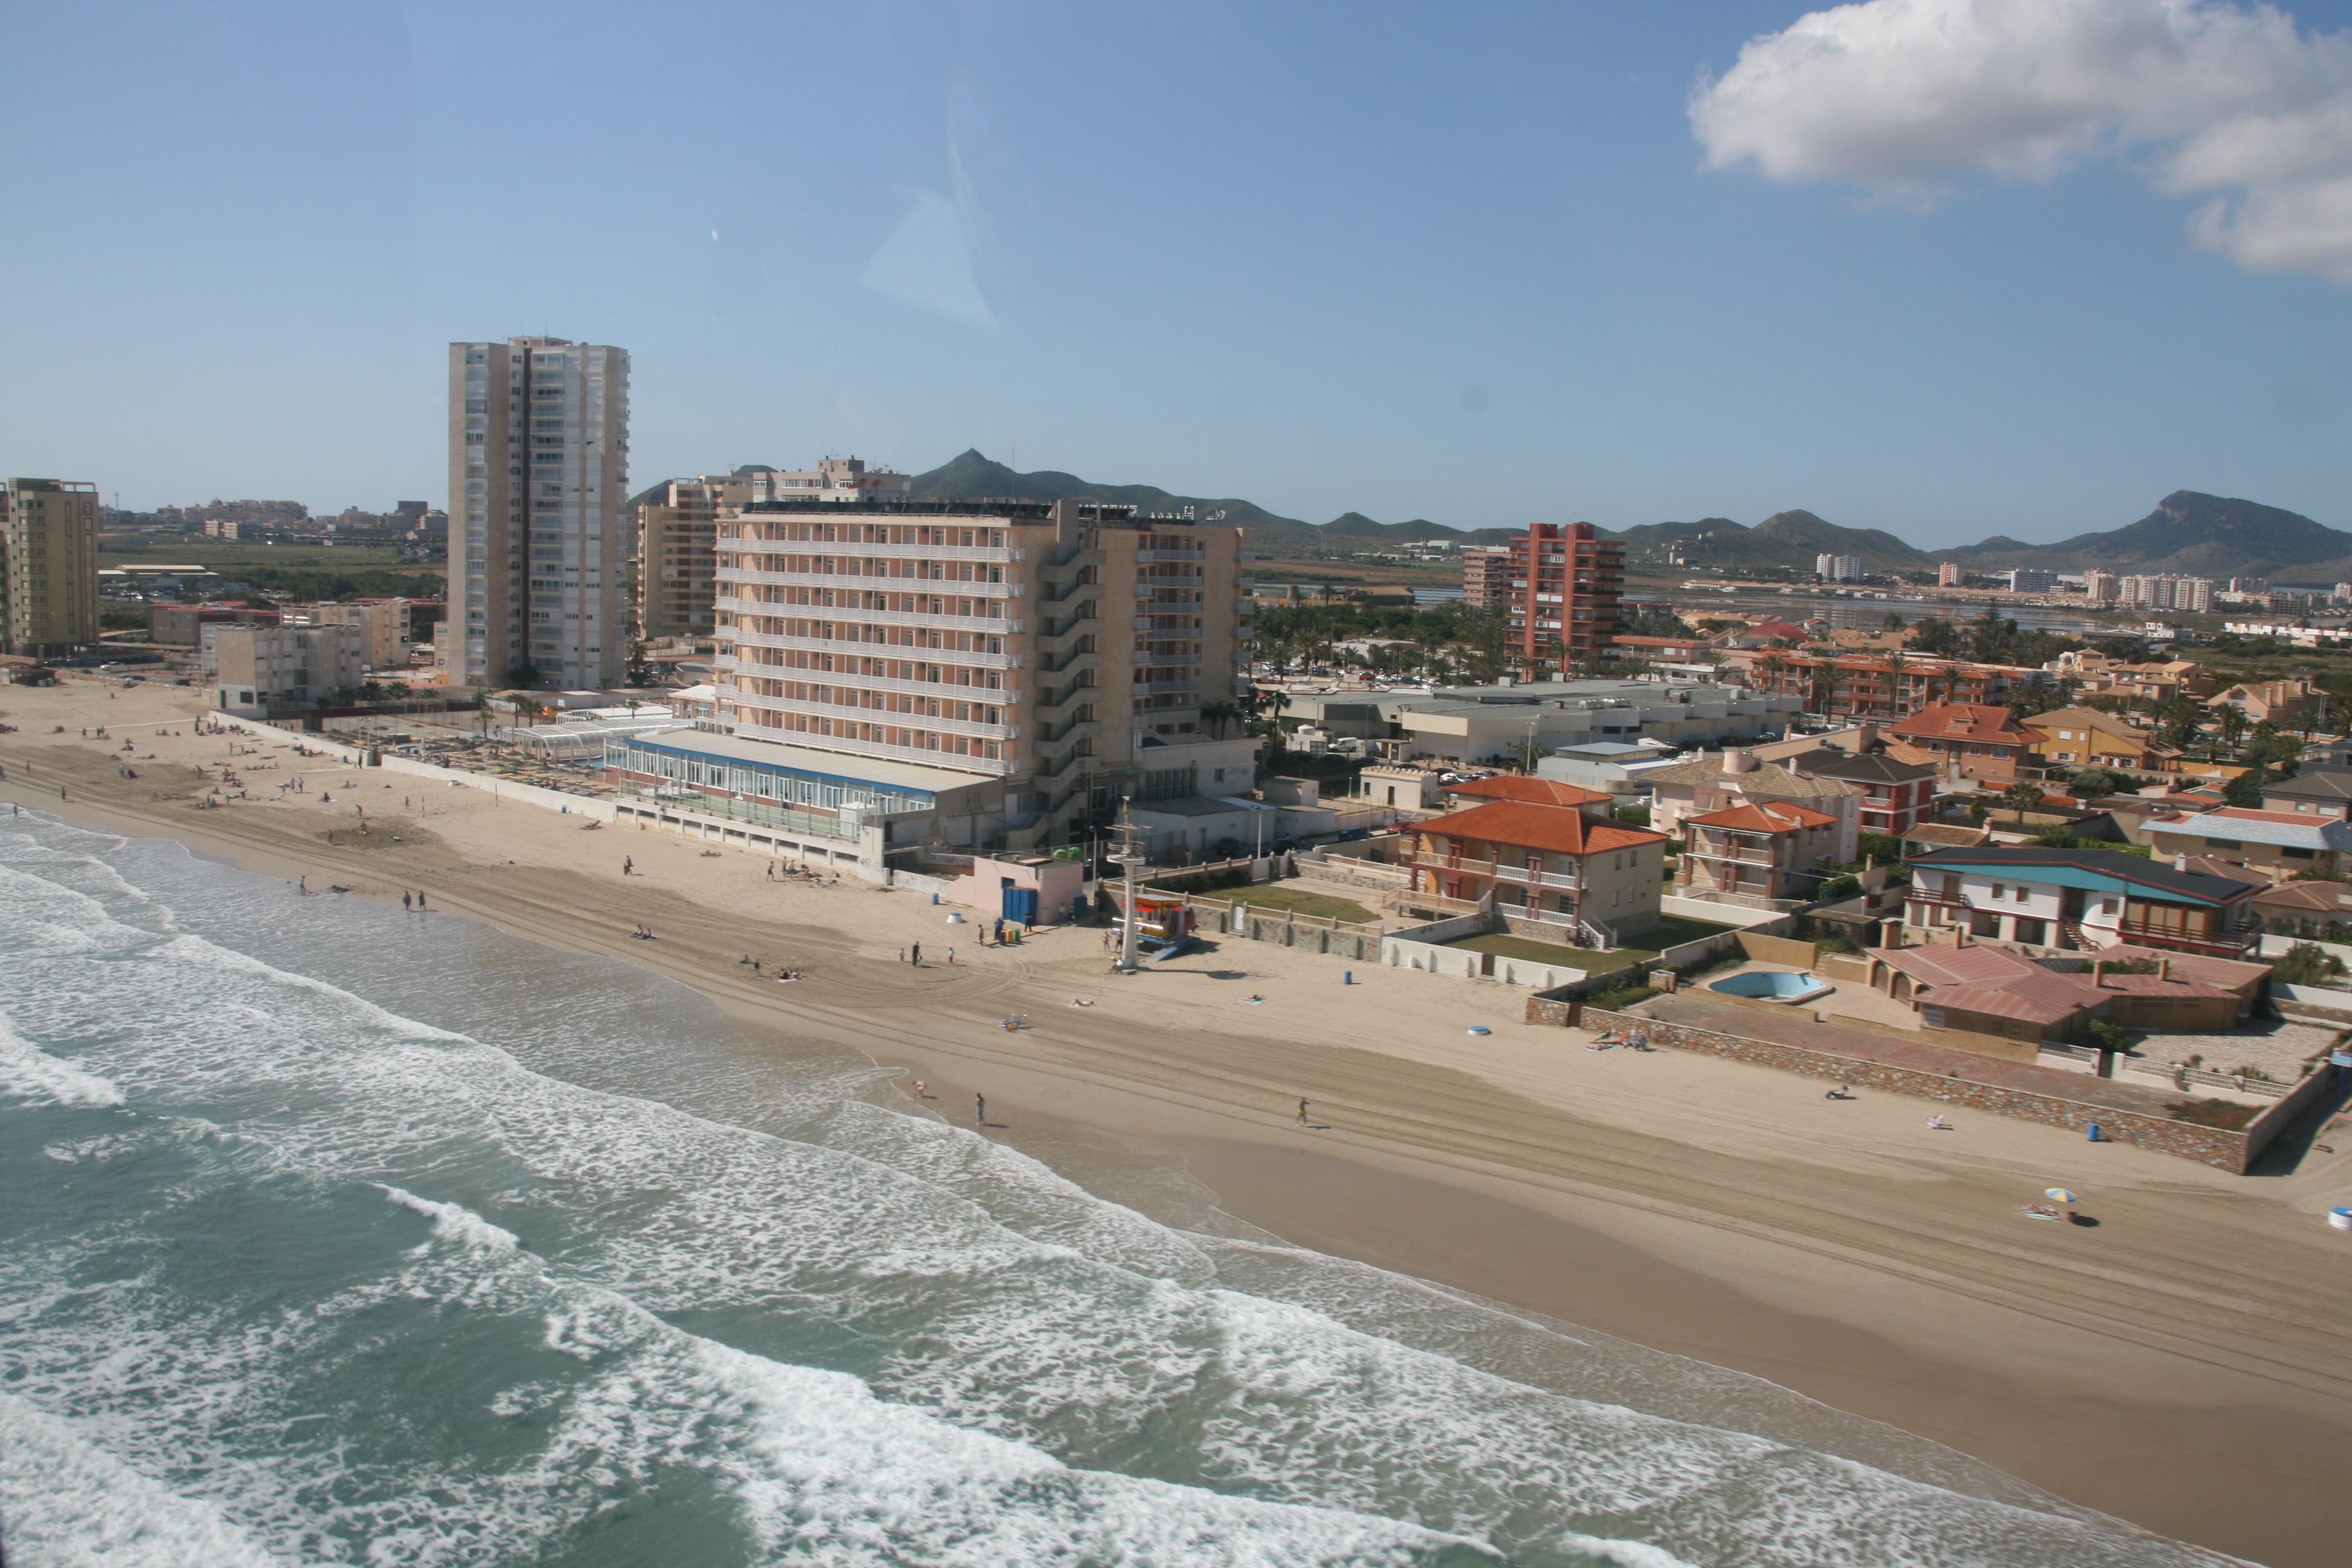 Playa cartagena chile fotos 89